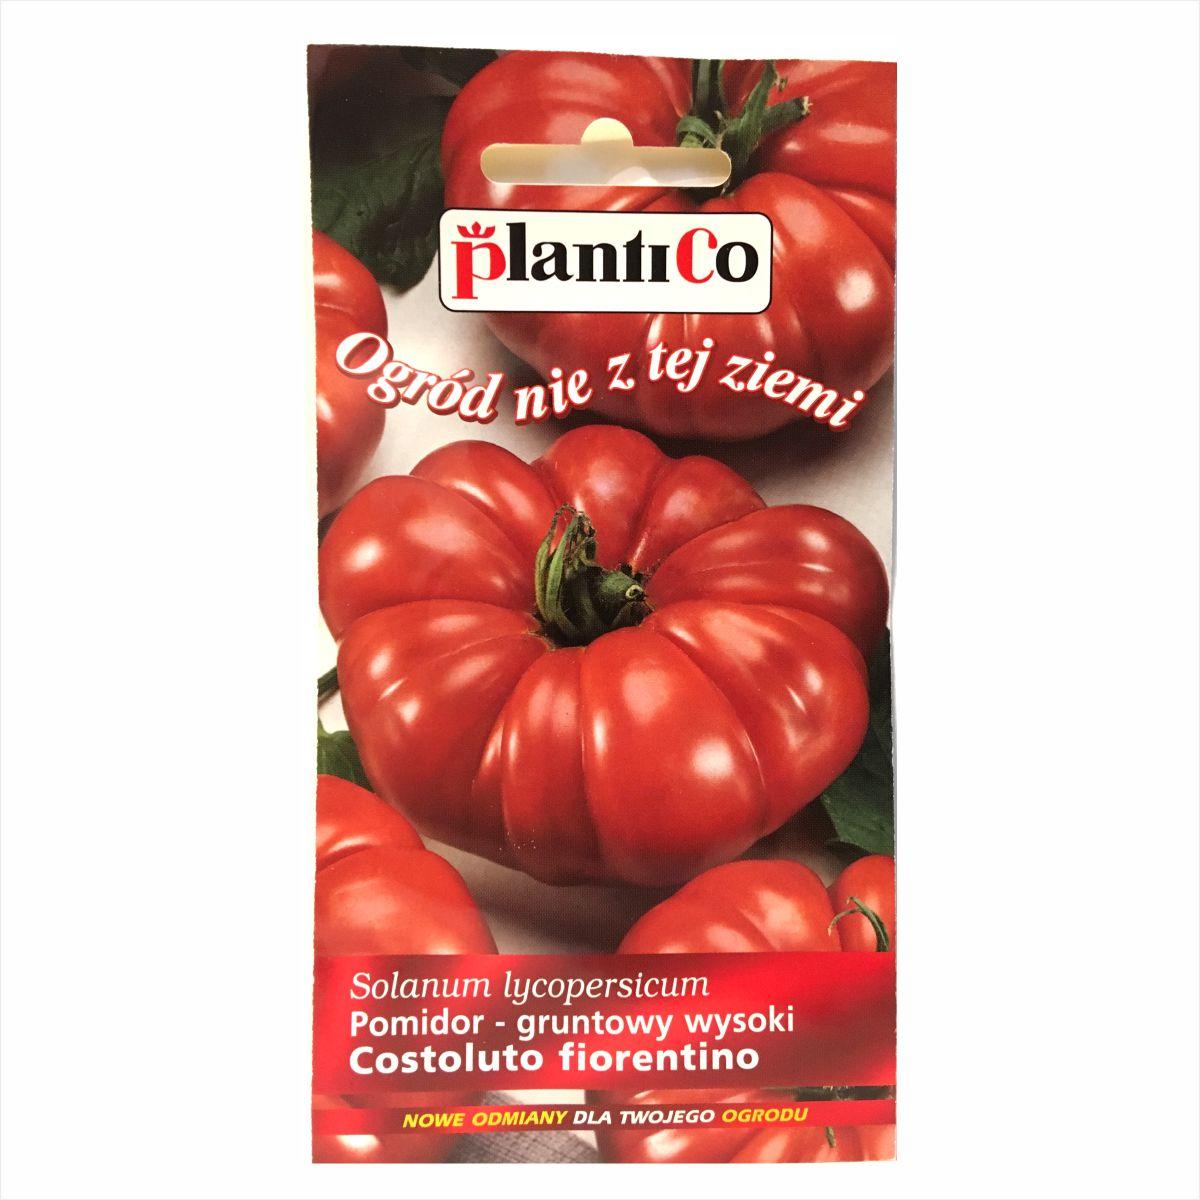 Pomidor Costoluto Fiorentino nasiona Plantico